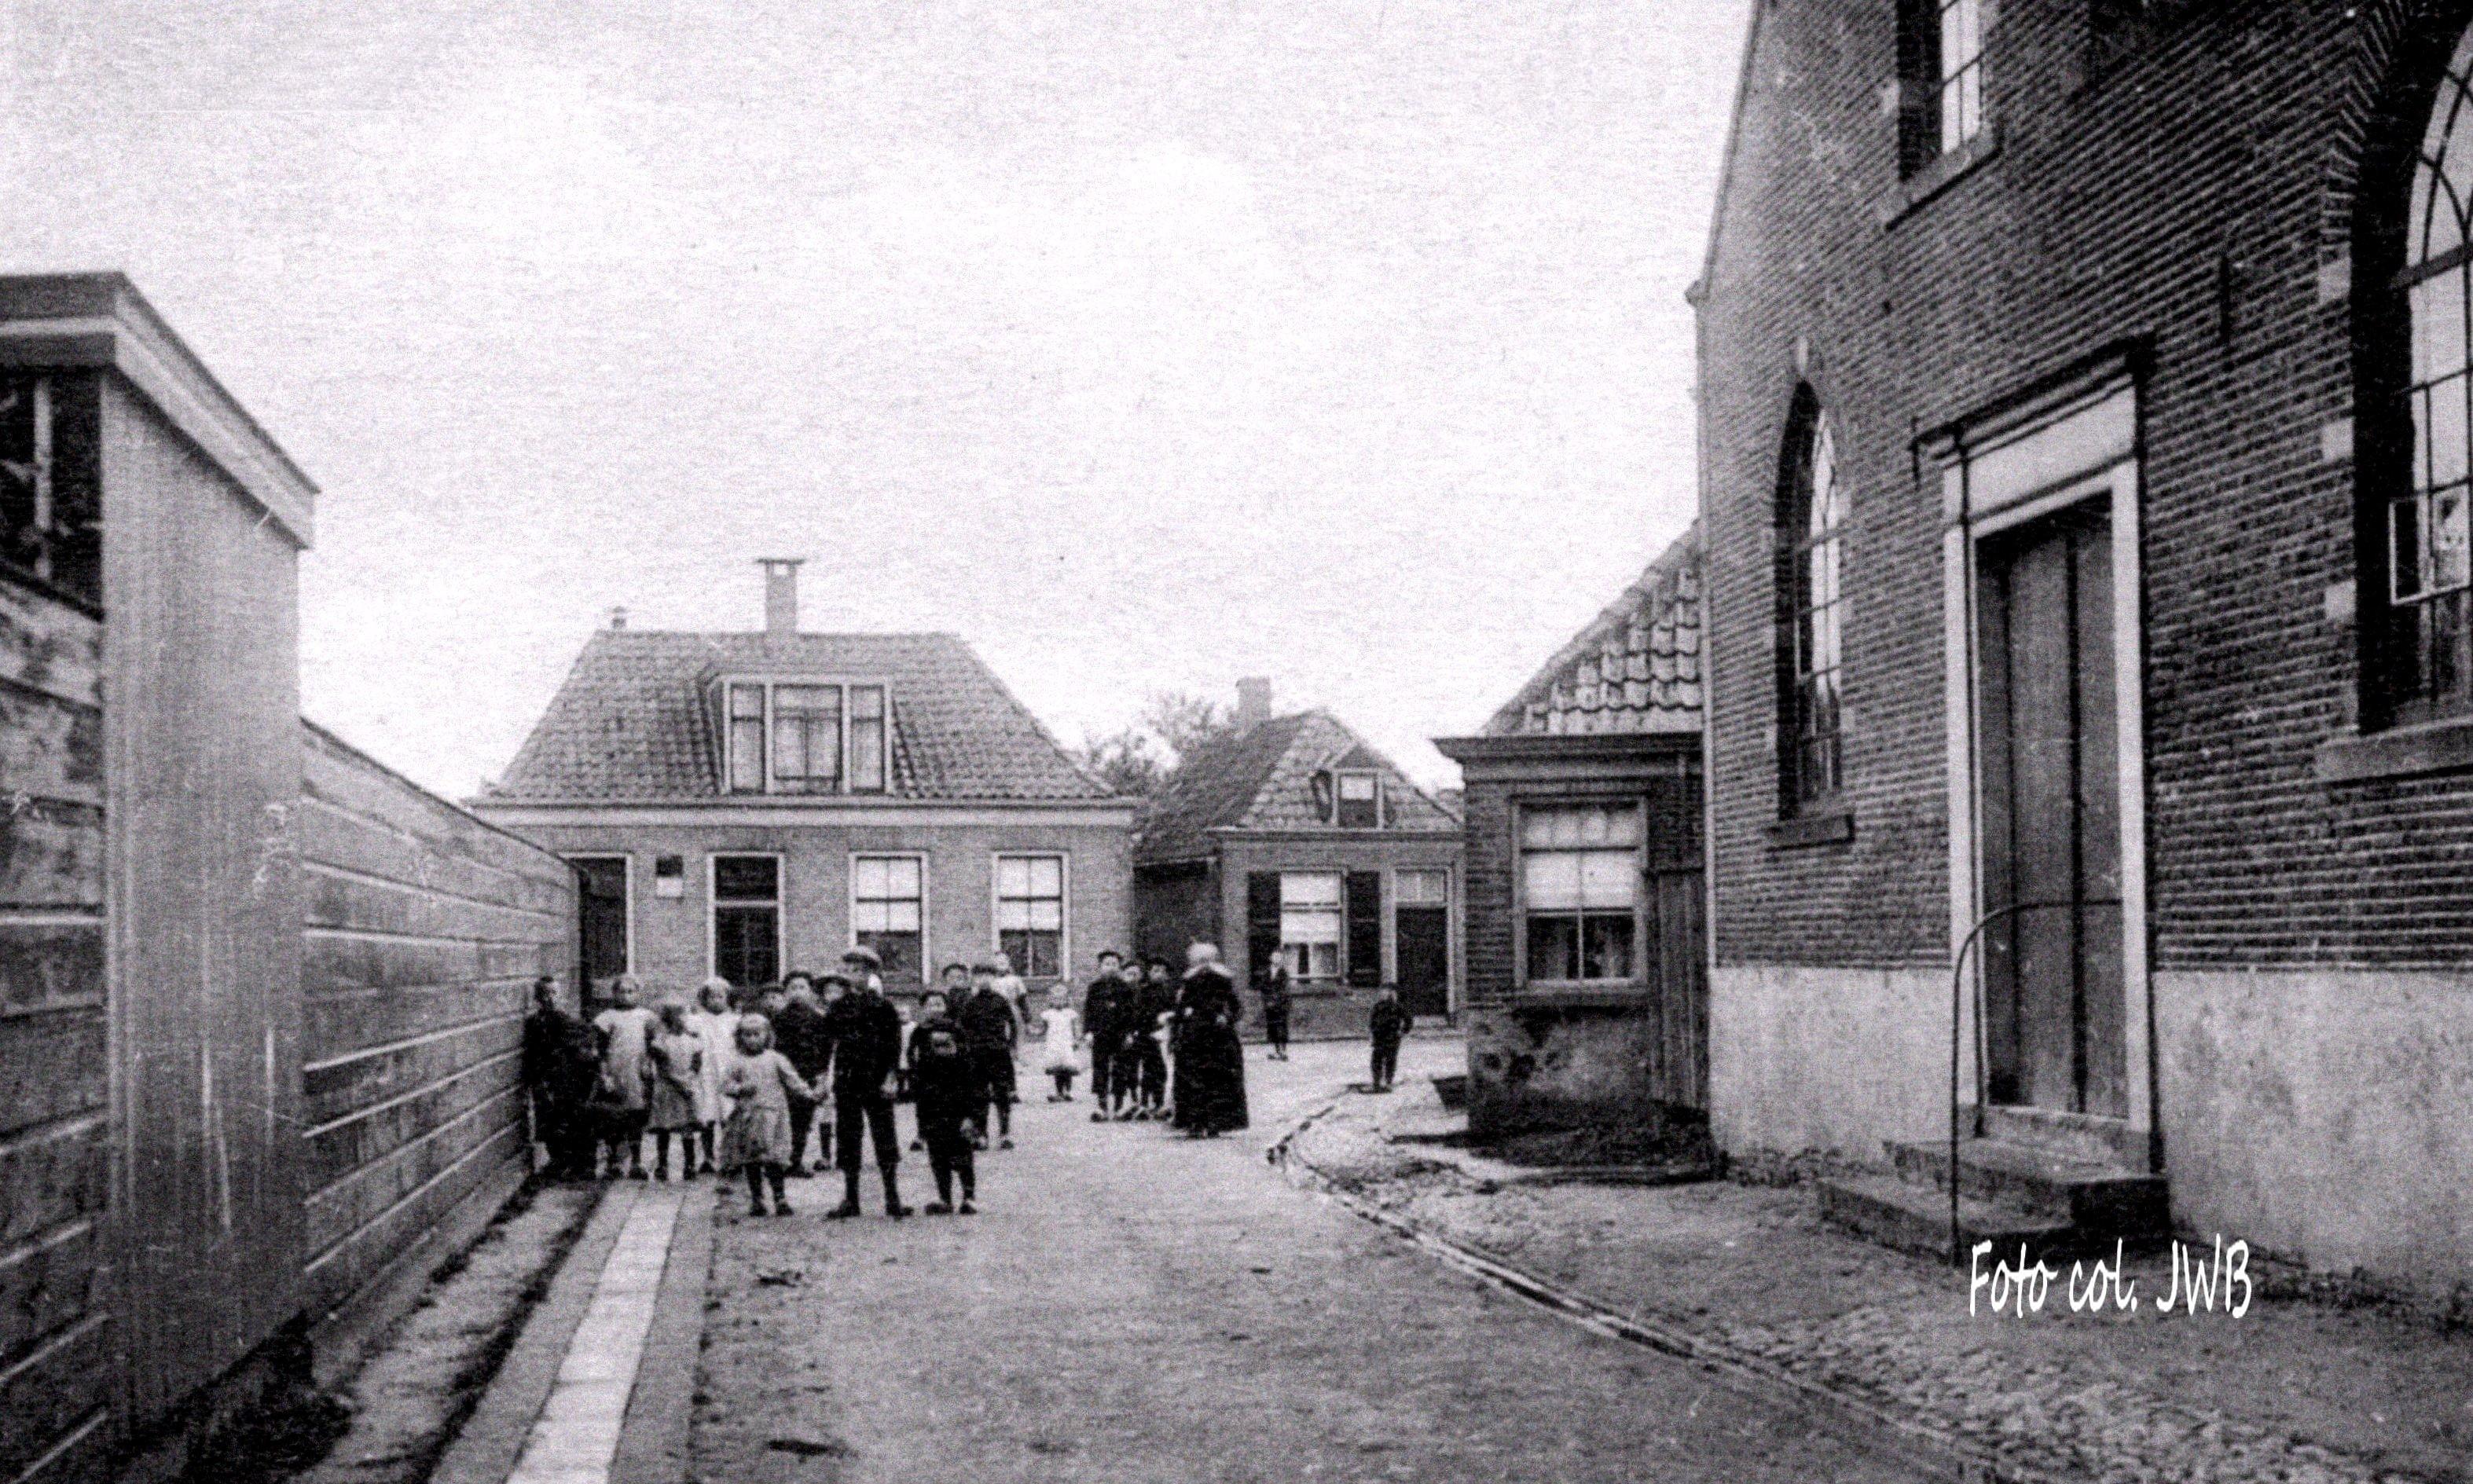 dalfsen emmastr.viergez. ger. kerk ong. 1910